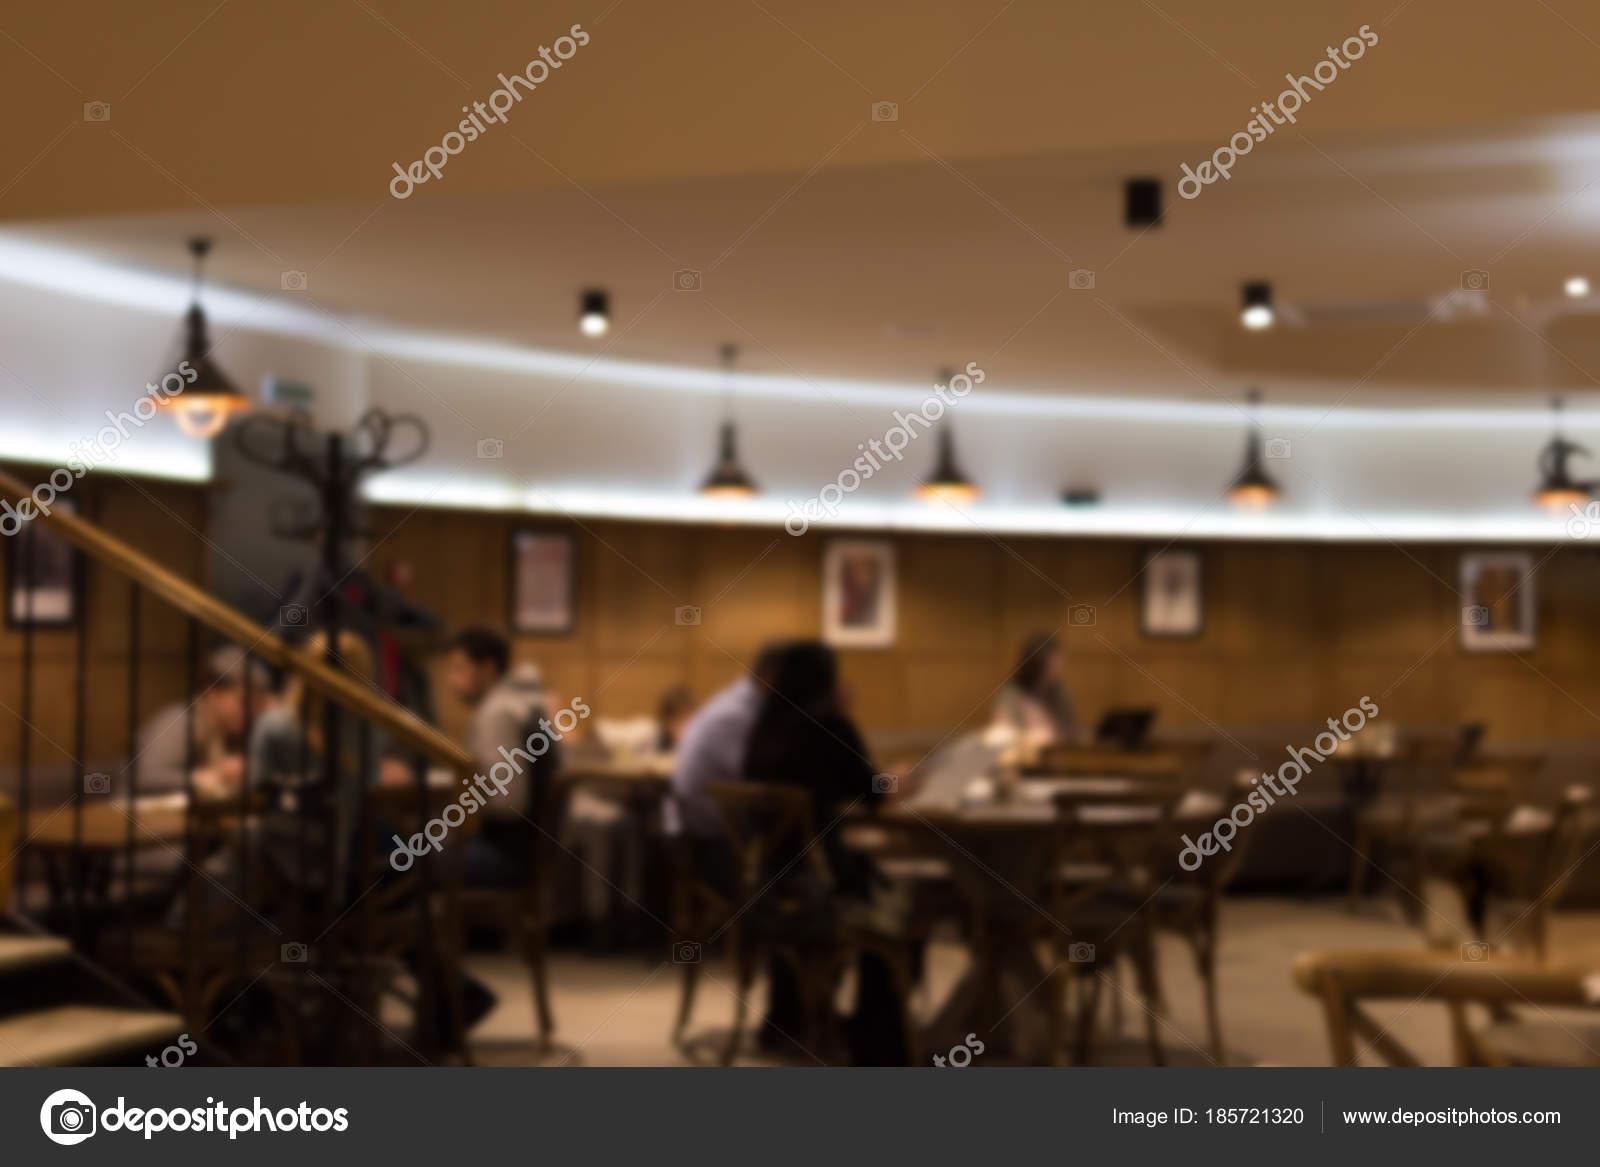 achtergrond wazig abstracte restaurant warme avond kleuren van caf interieur vintage intreepupil bar hall foto van gorlovkv